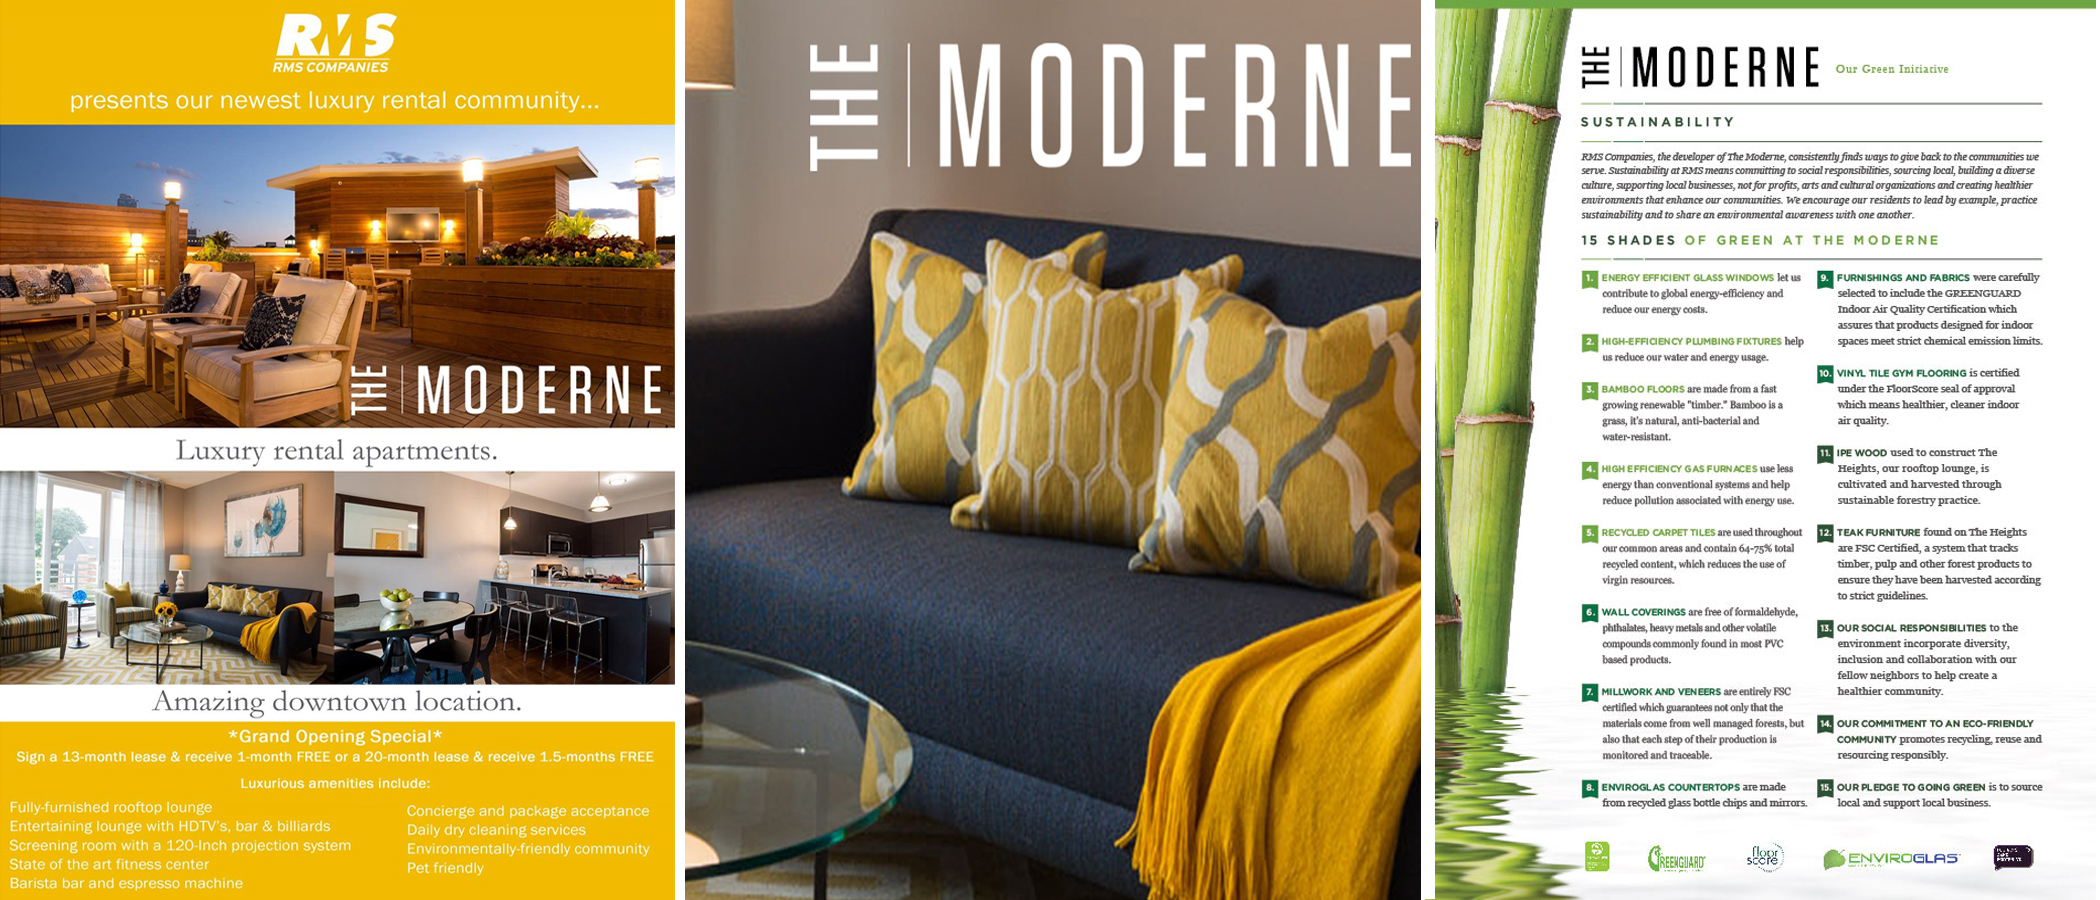 Moderne Collage.jpg